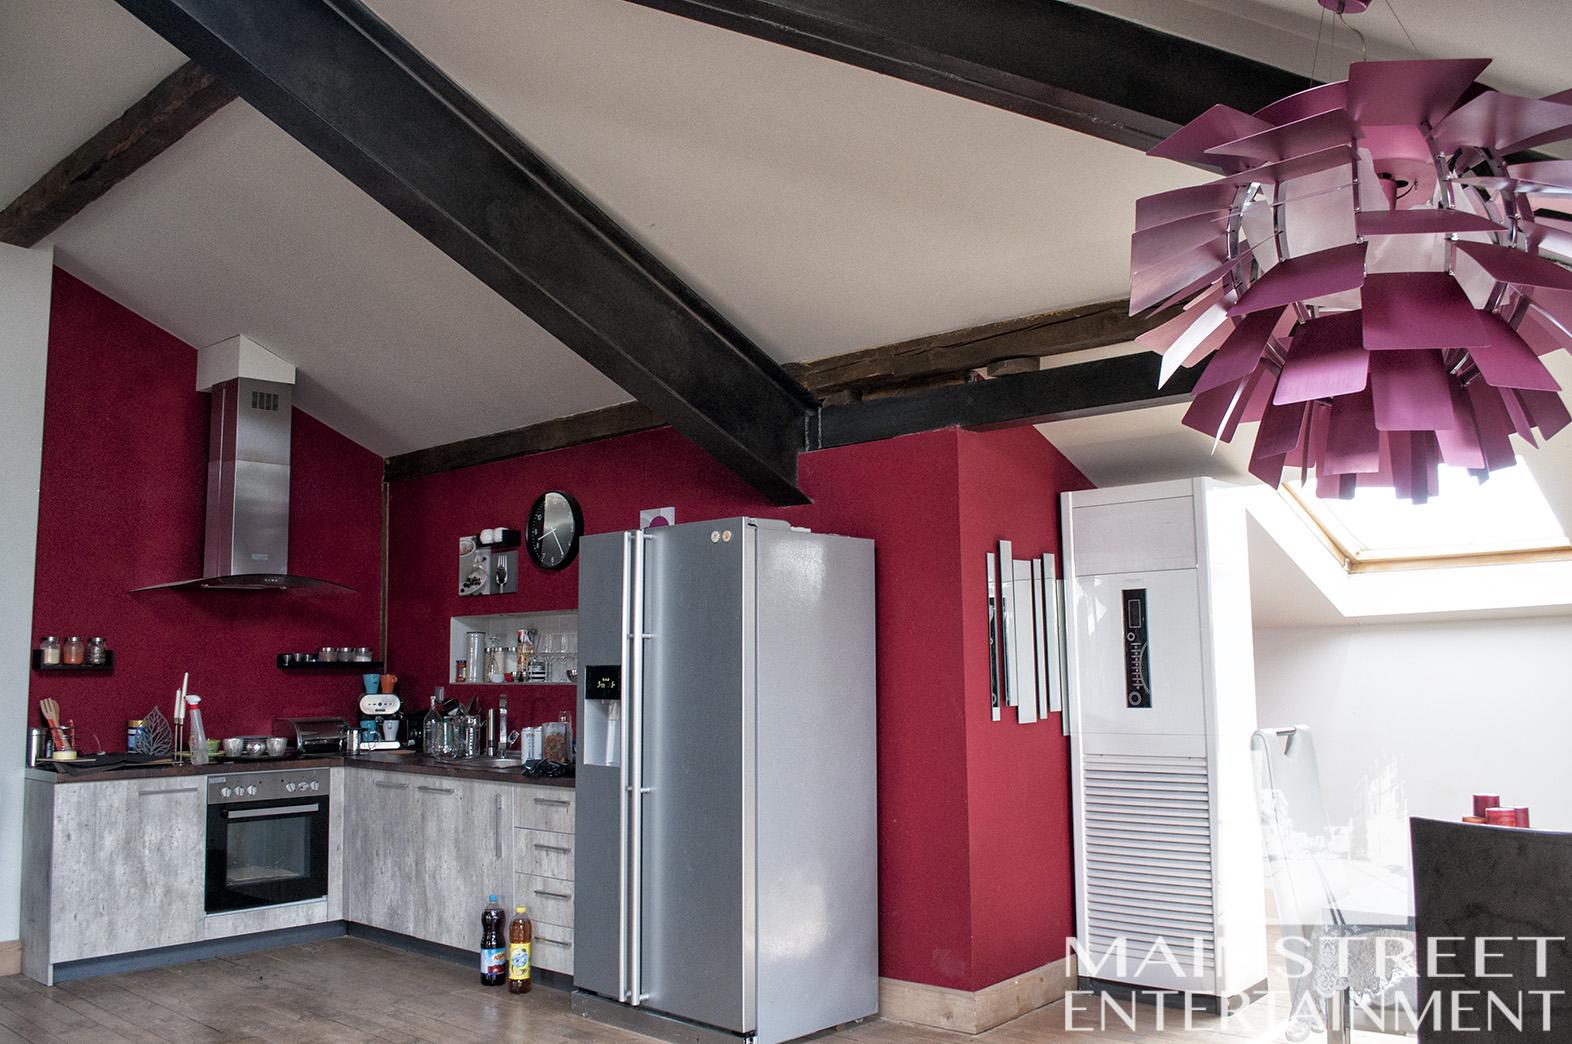 Movie set loft apartment kitchen